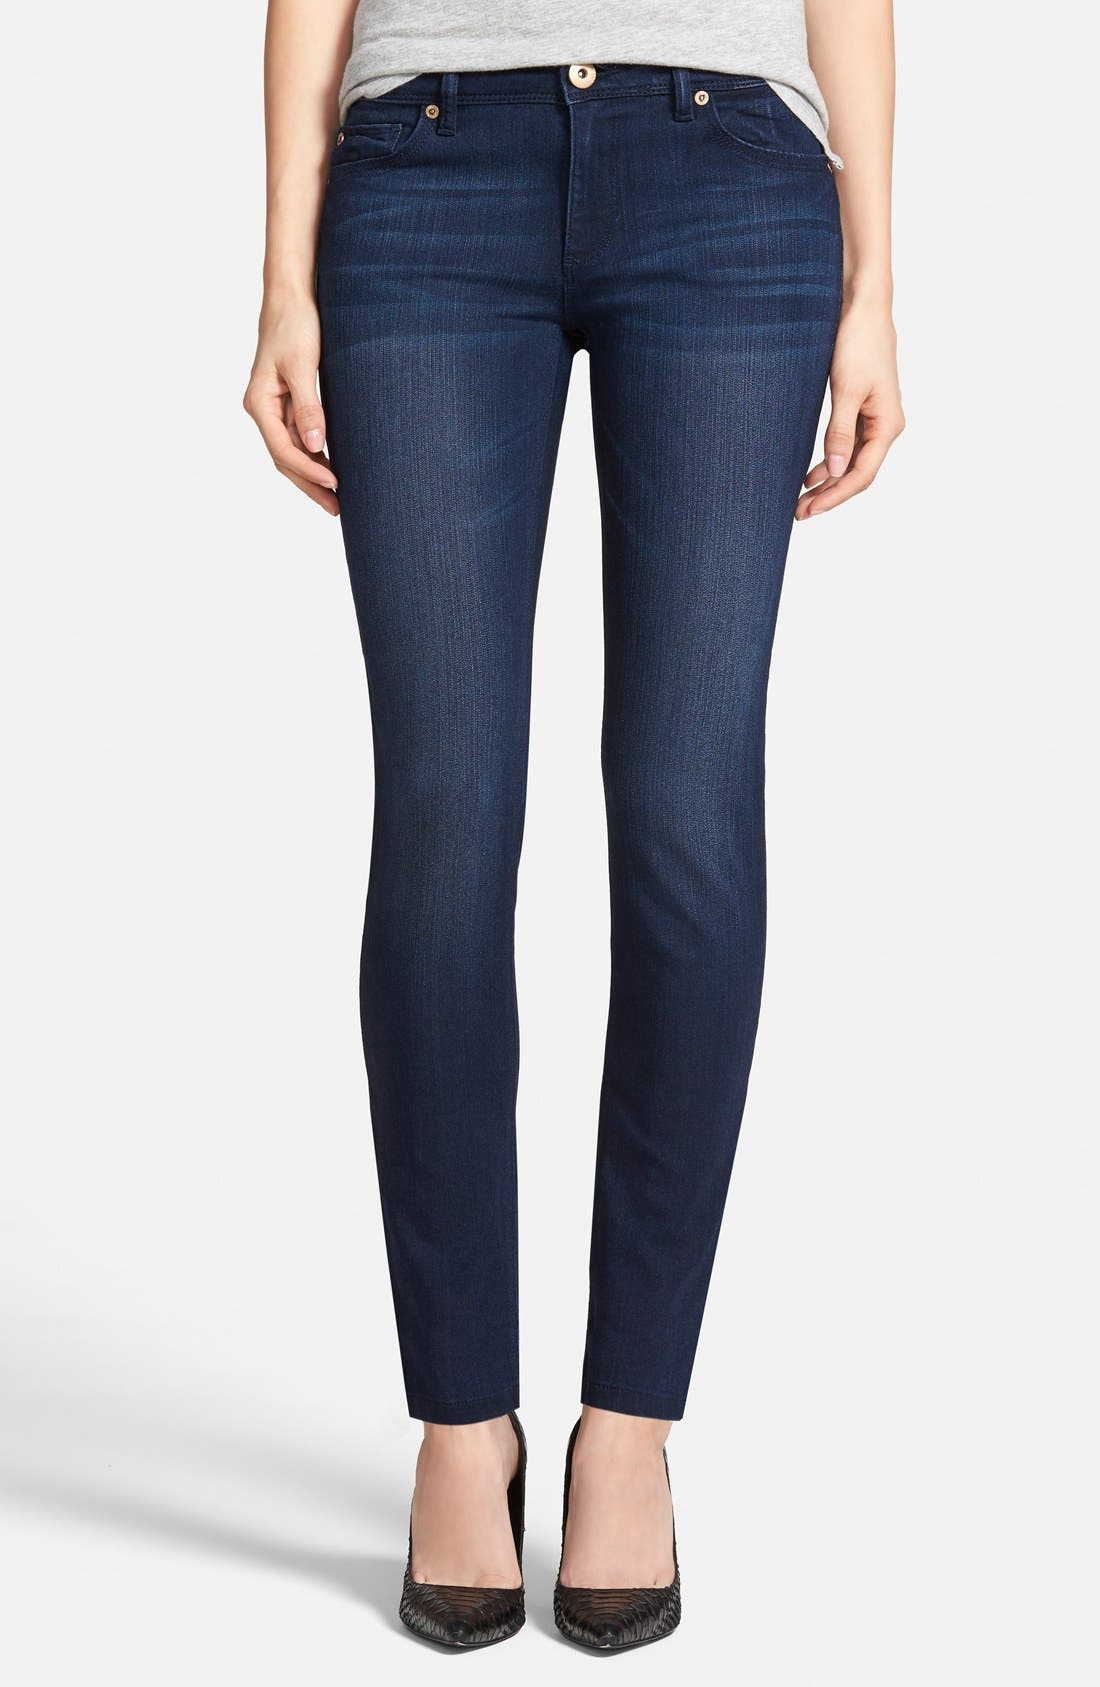 Main Image - DL1961 'Emma' Power Legging Jeans (Berlin)